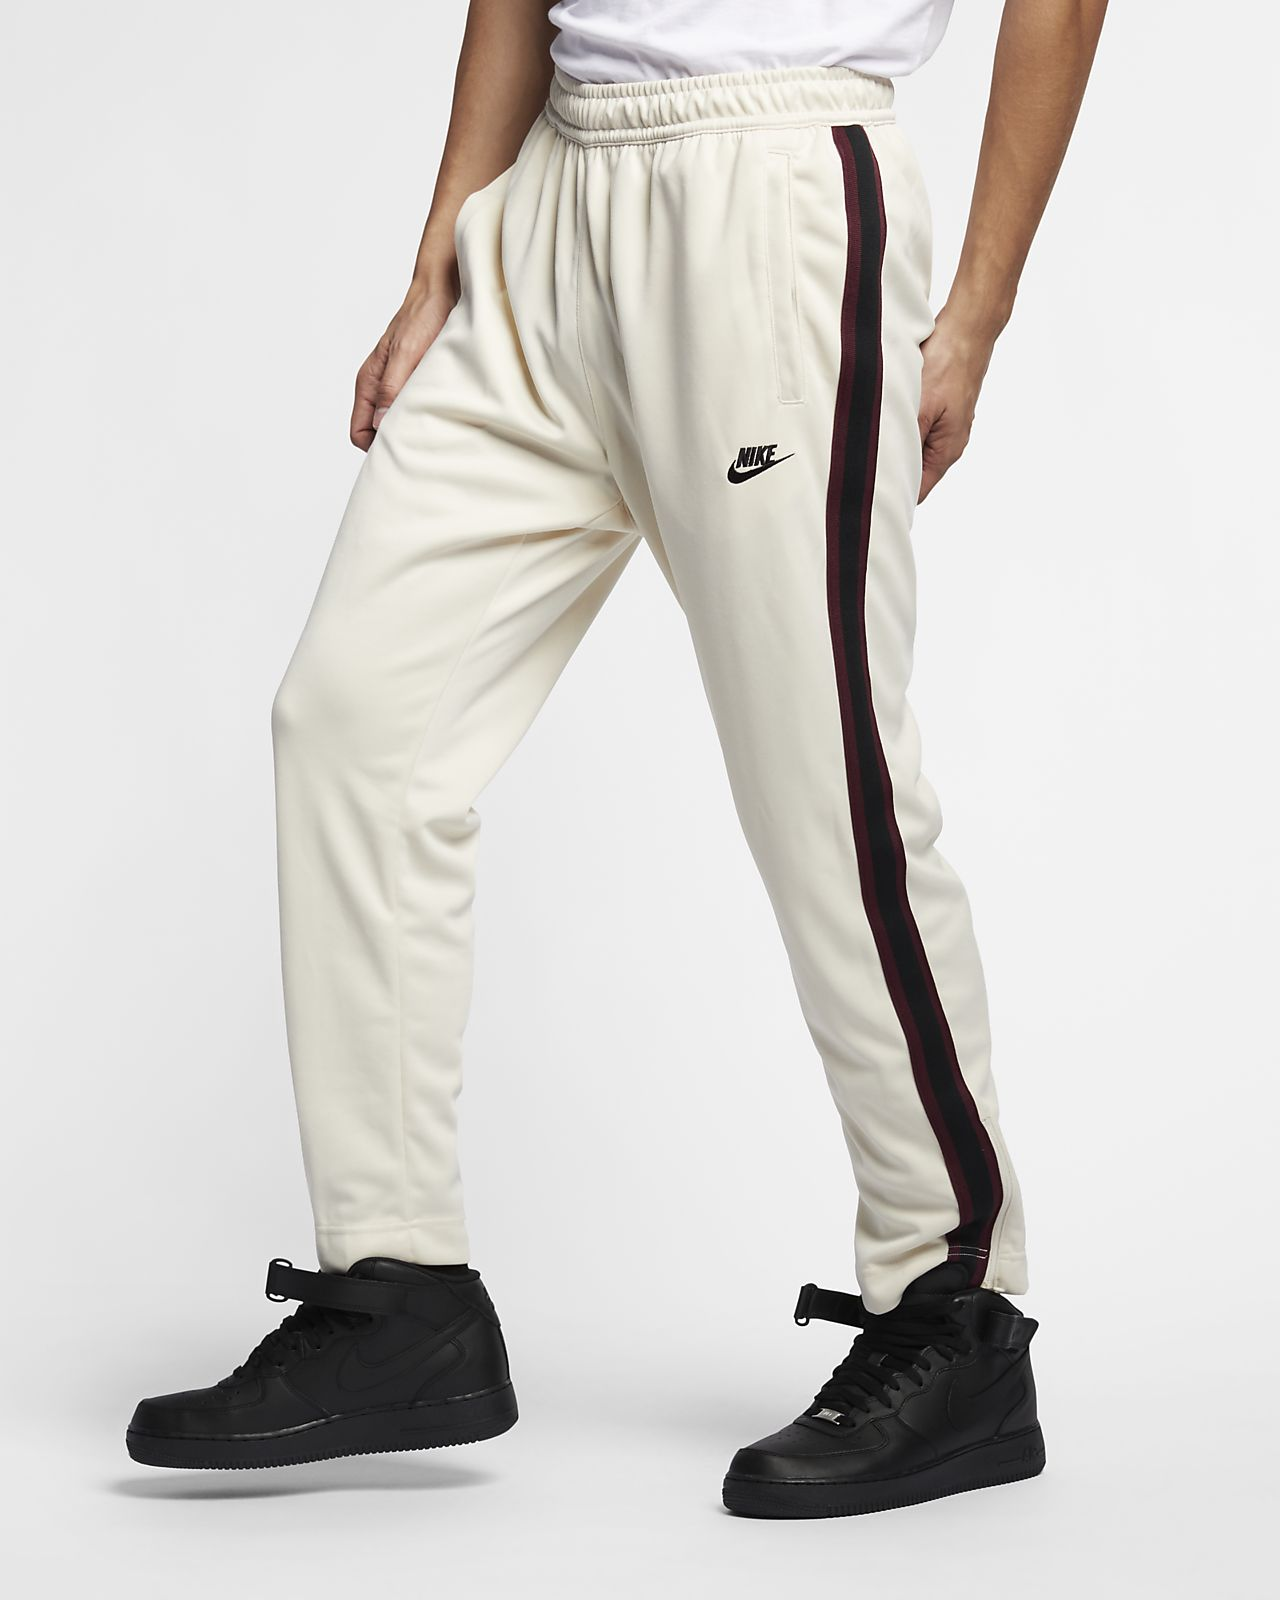 Pour Sportswear Nike Ch Homme Pantalon p8aEwxq5q